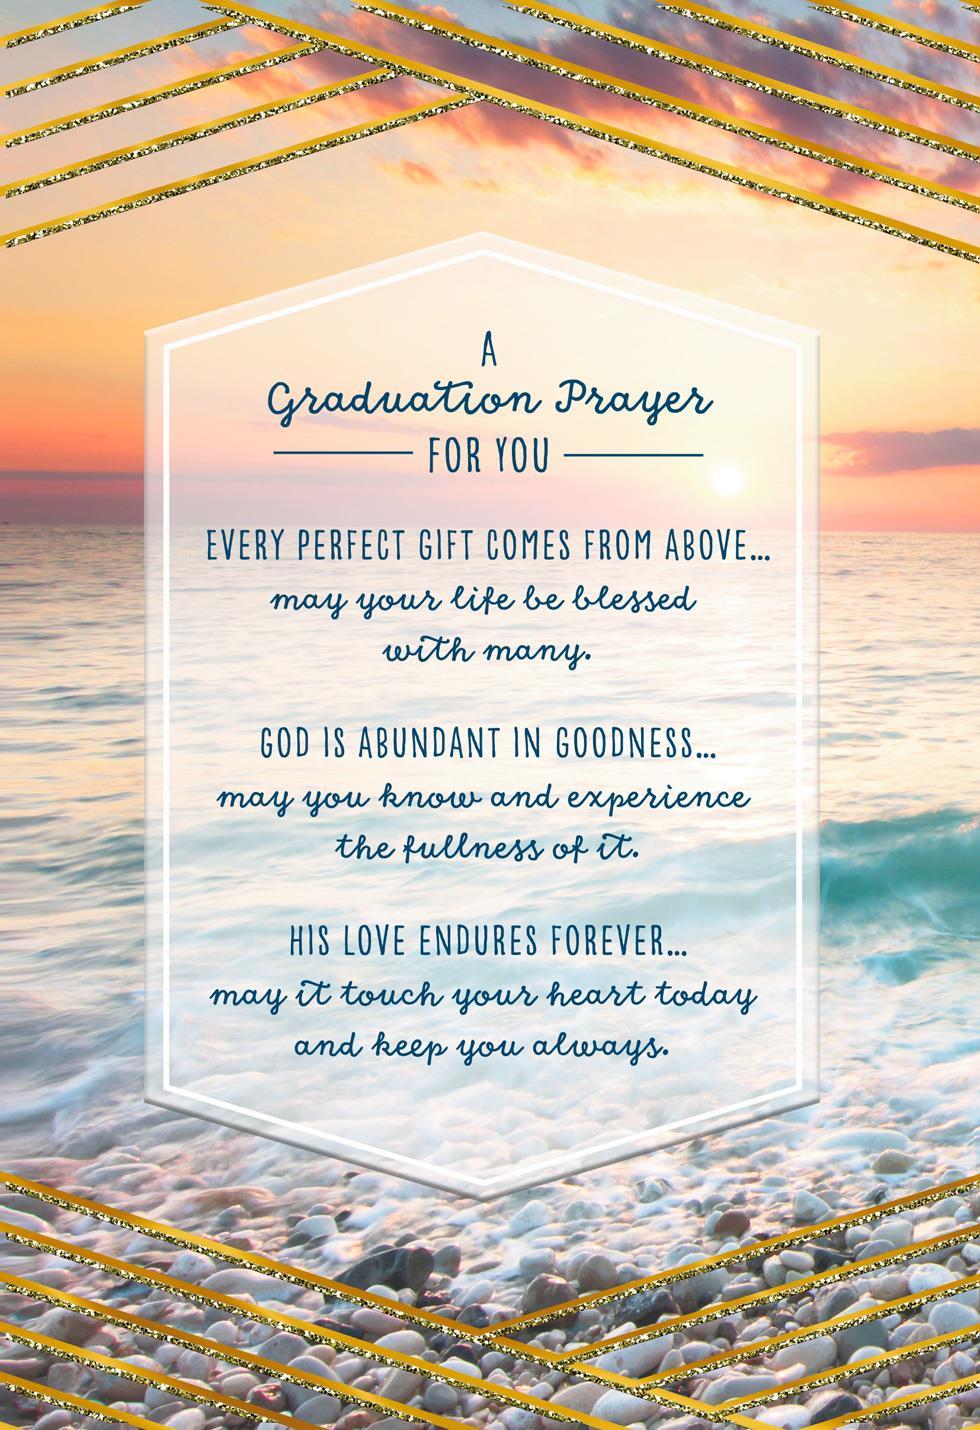 Prayer for You Religious Graduation Card - Greeting Cards ...